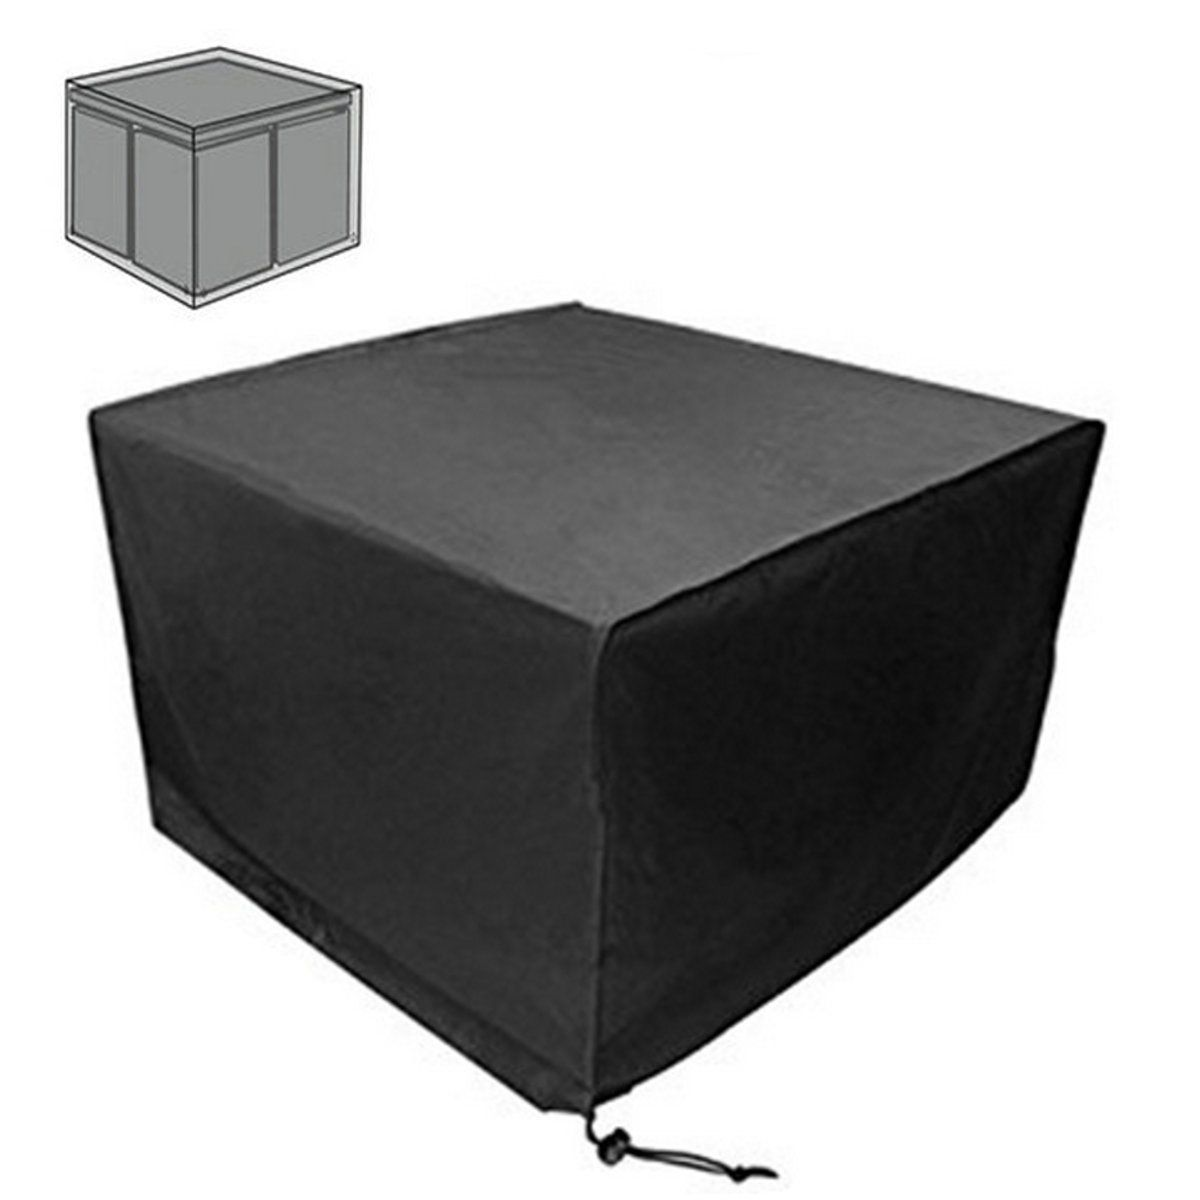 Recogida Muebles Pu?ol - Ipree 160x160x84cm Al Aire Libre Patio De Jard N Impermeable Cube [mjhdah]https://i.pinimg.com/736x/6a/df/27/6adf27460b0c6130a83f597d9a6757a7.jpg